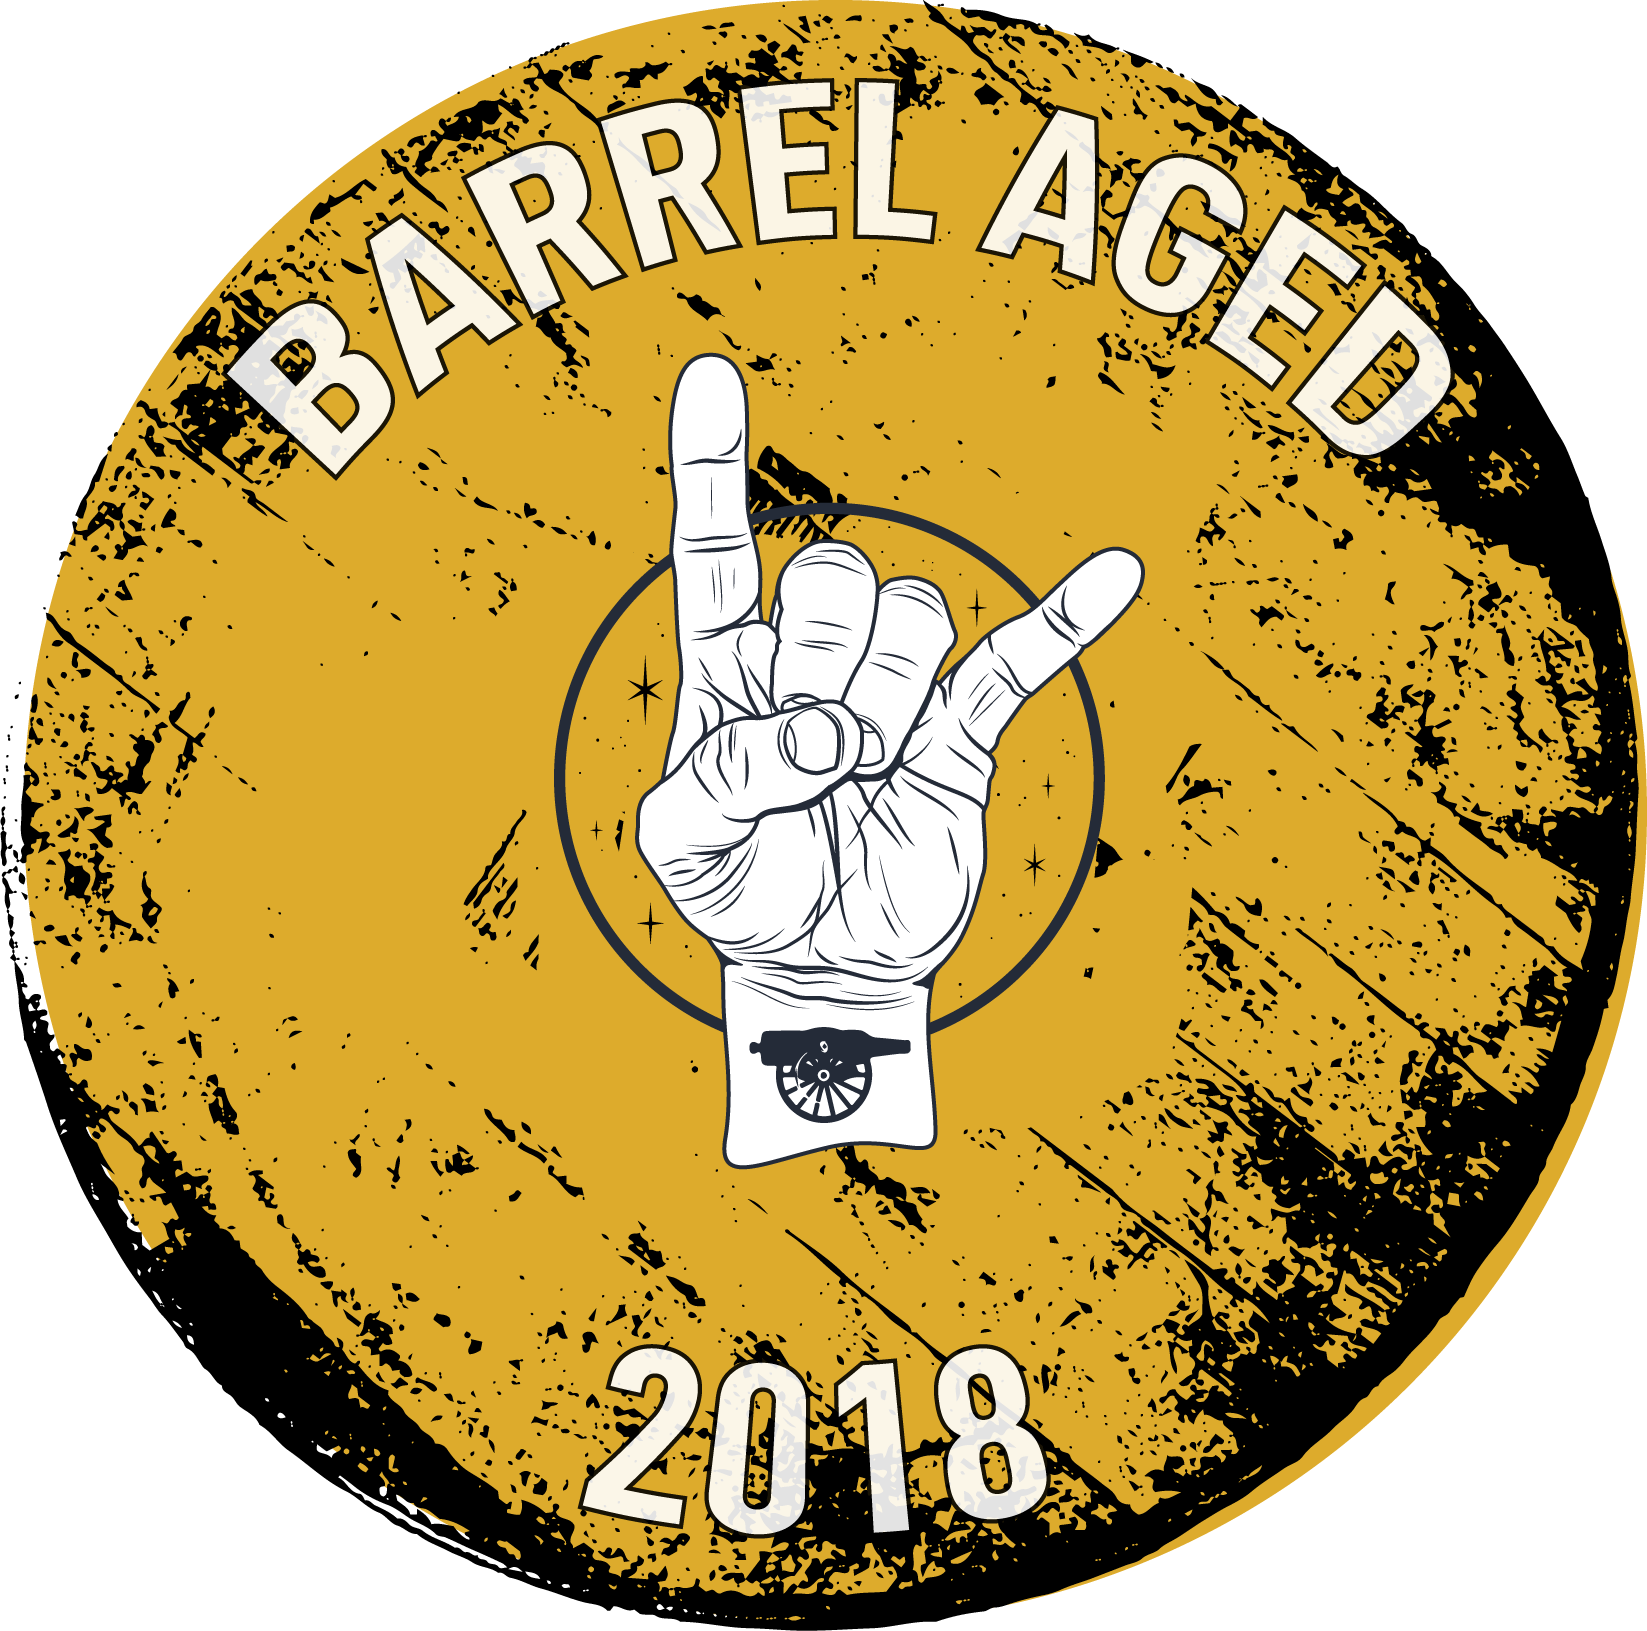 barrelaged_stickerV1.png